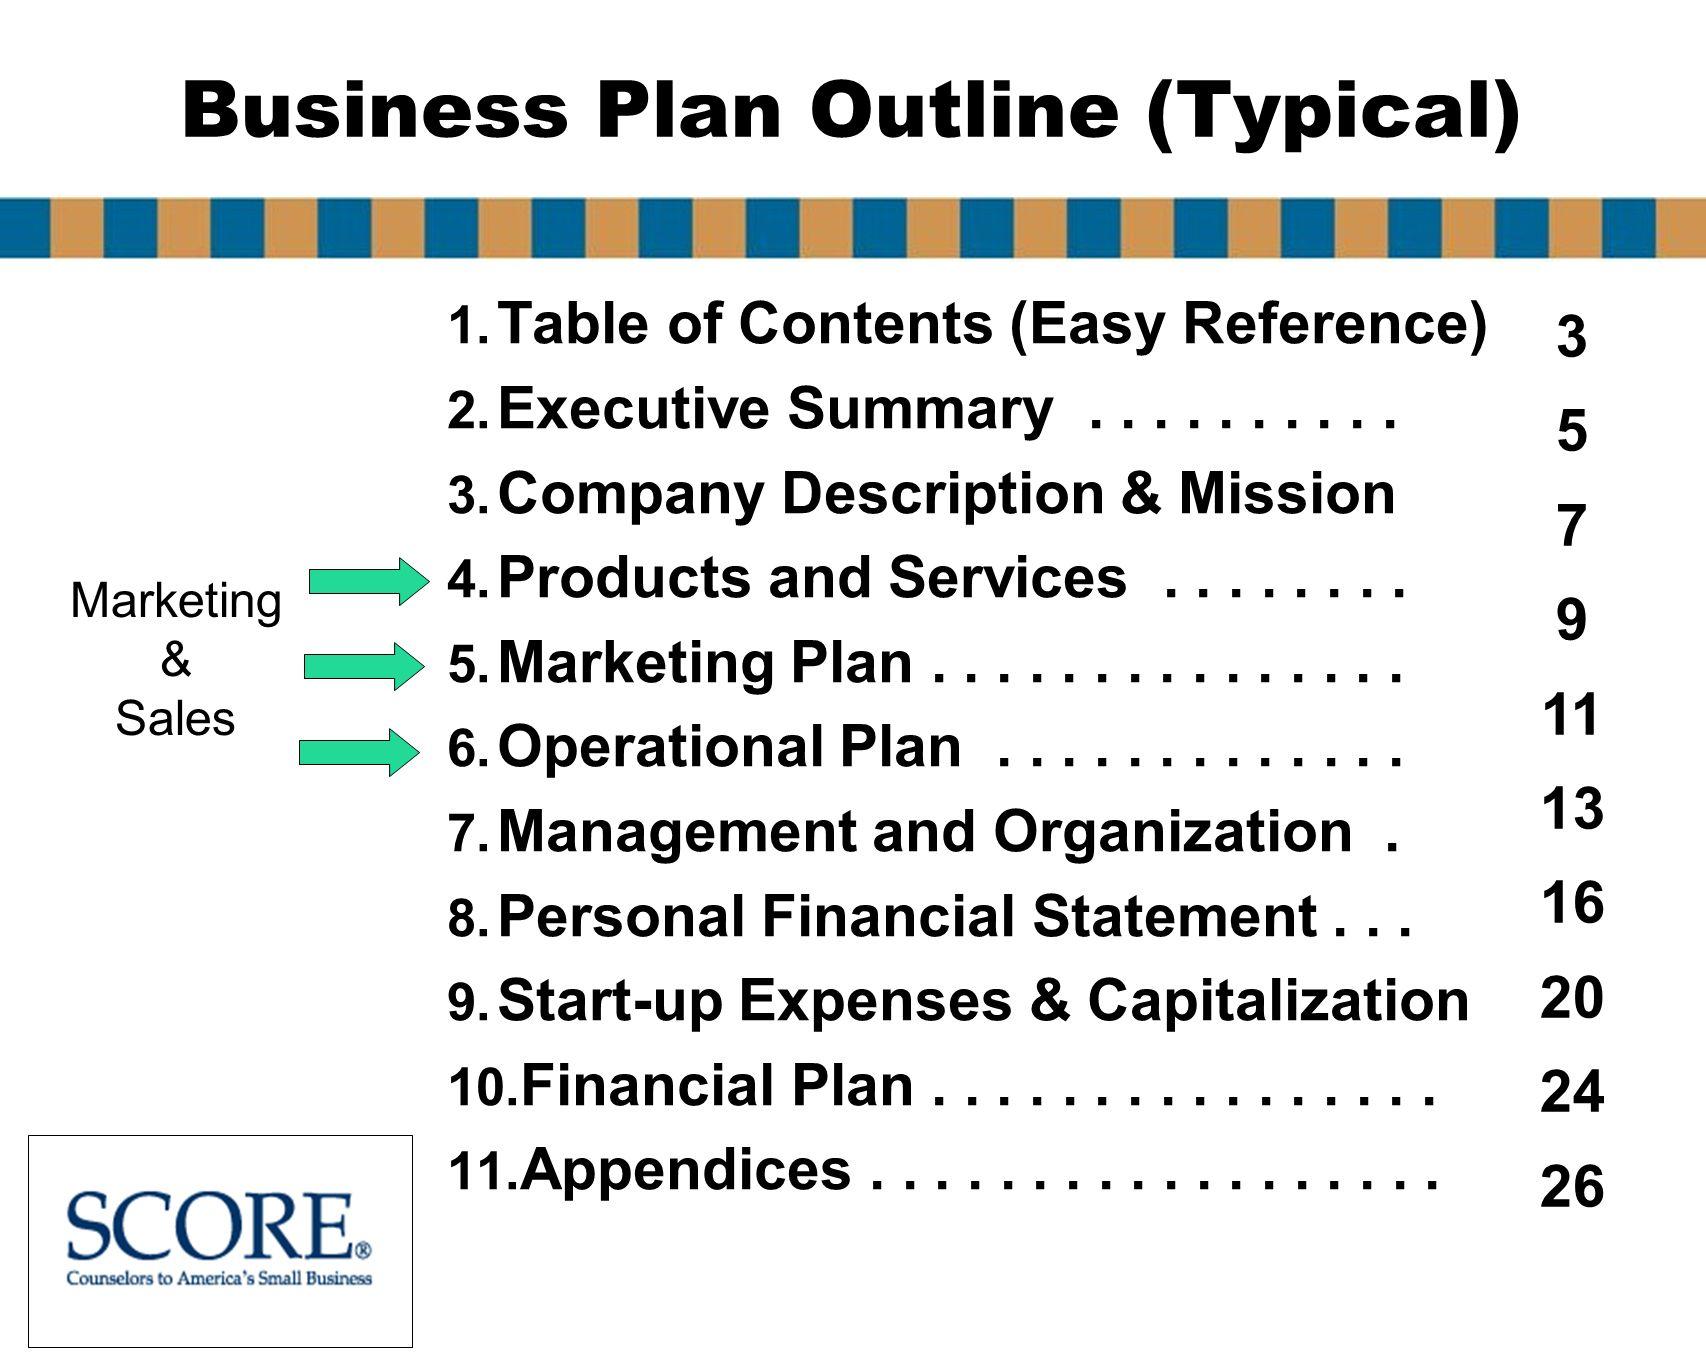 score financial templates - marketing and sales score workshops live your dream score